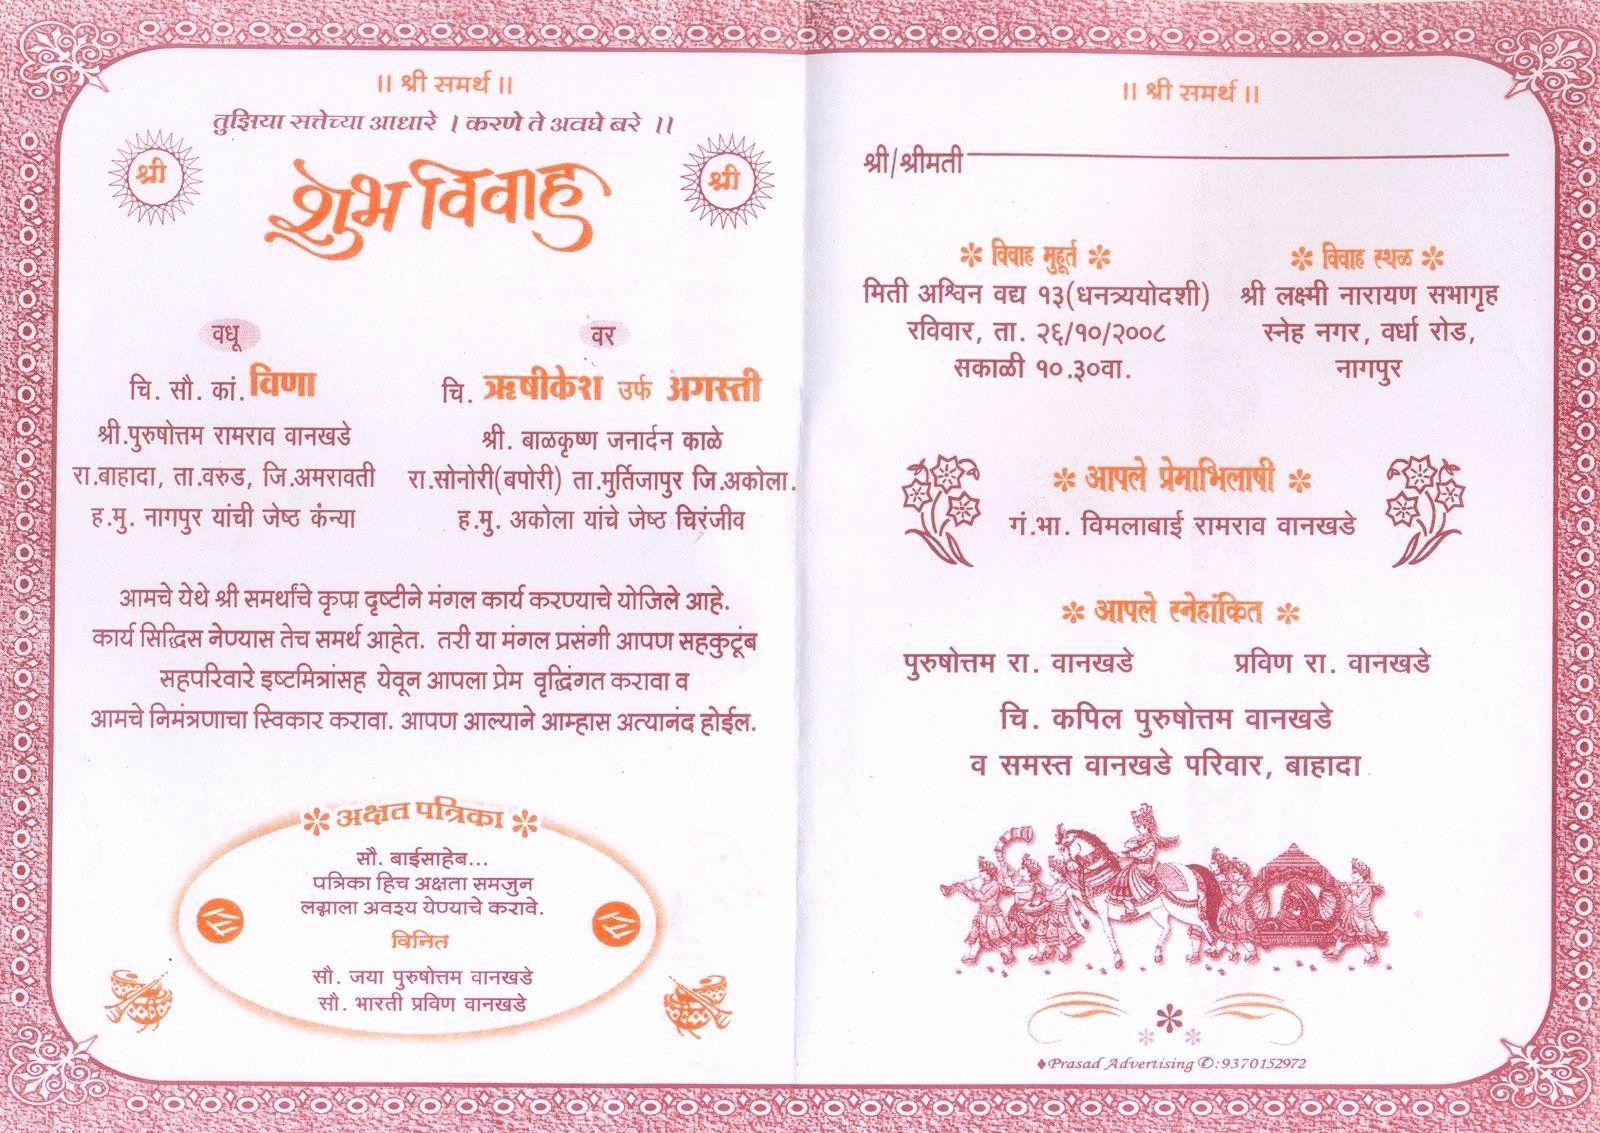 Birthday Invitation Card In Hindi Best Of Invitation Card For Birthday Party In In 2020 Invitation Card Birthday Engagement Invitation Template Engagement Invitations